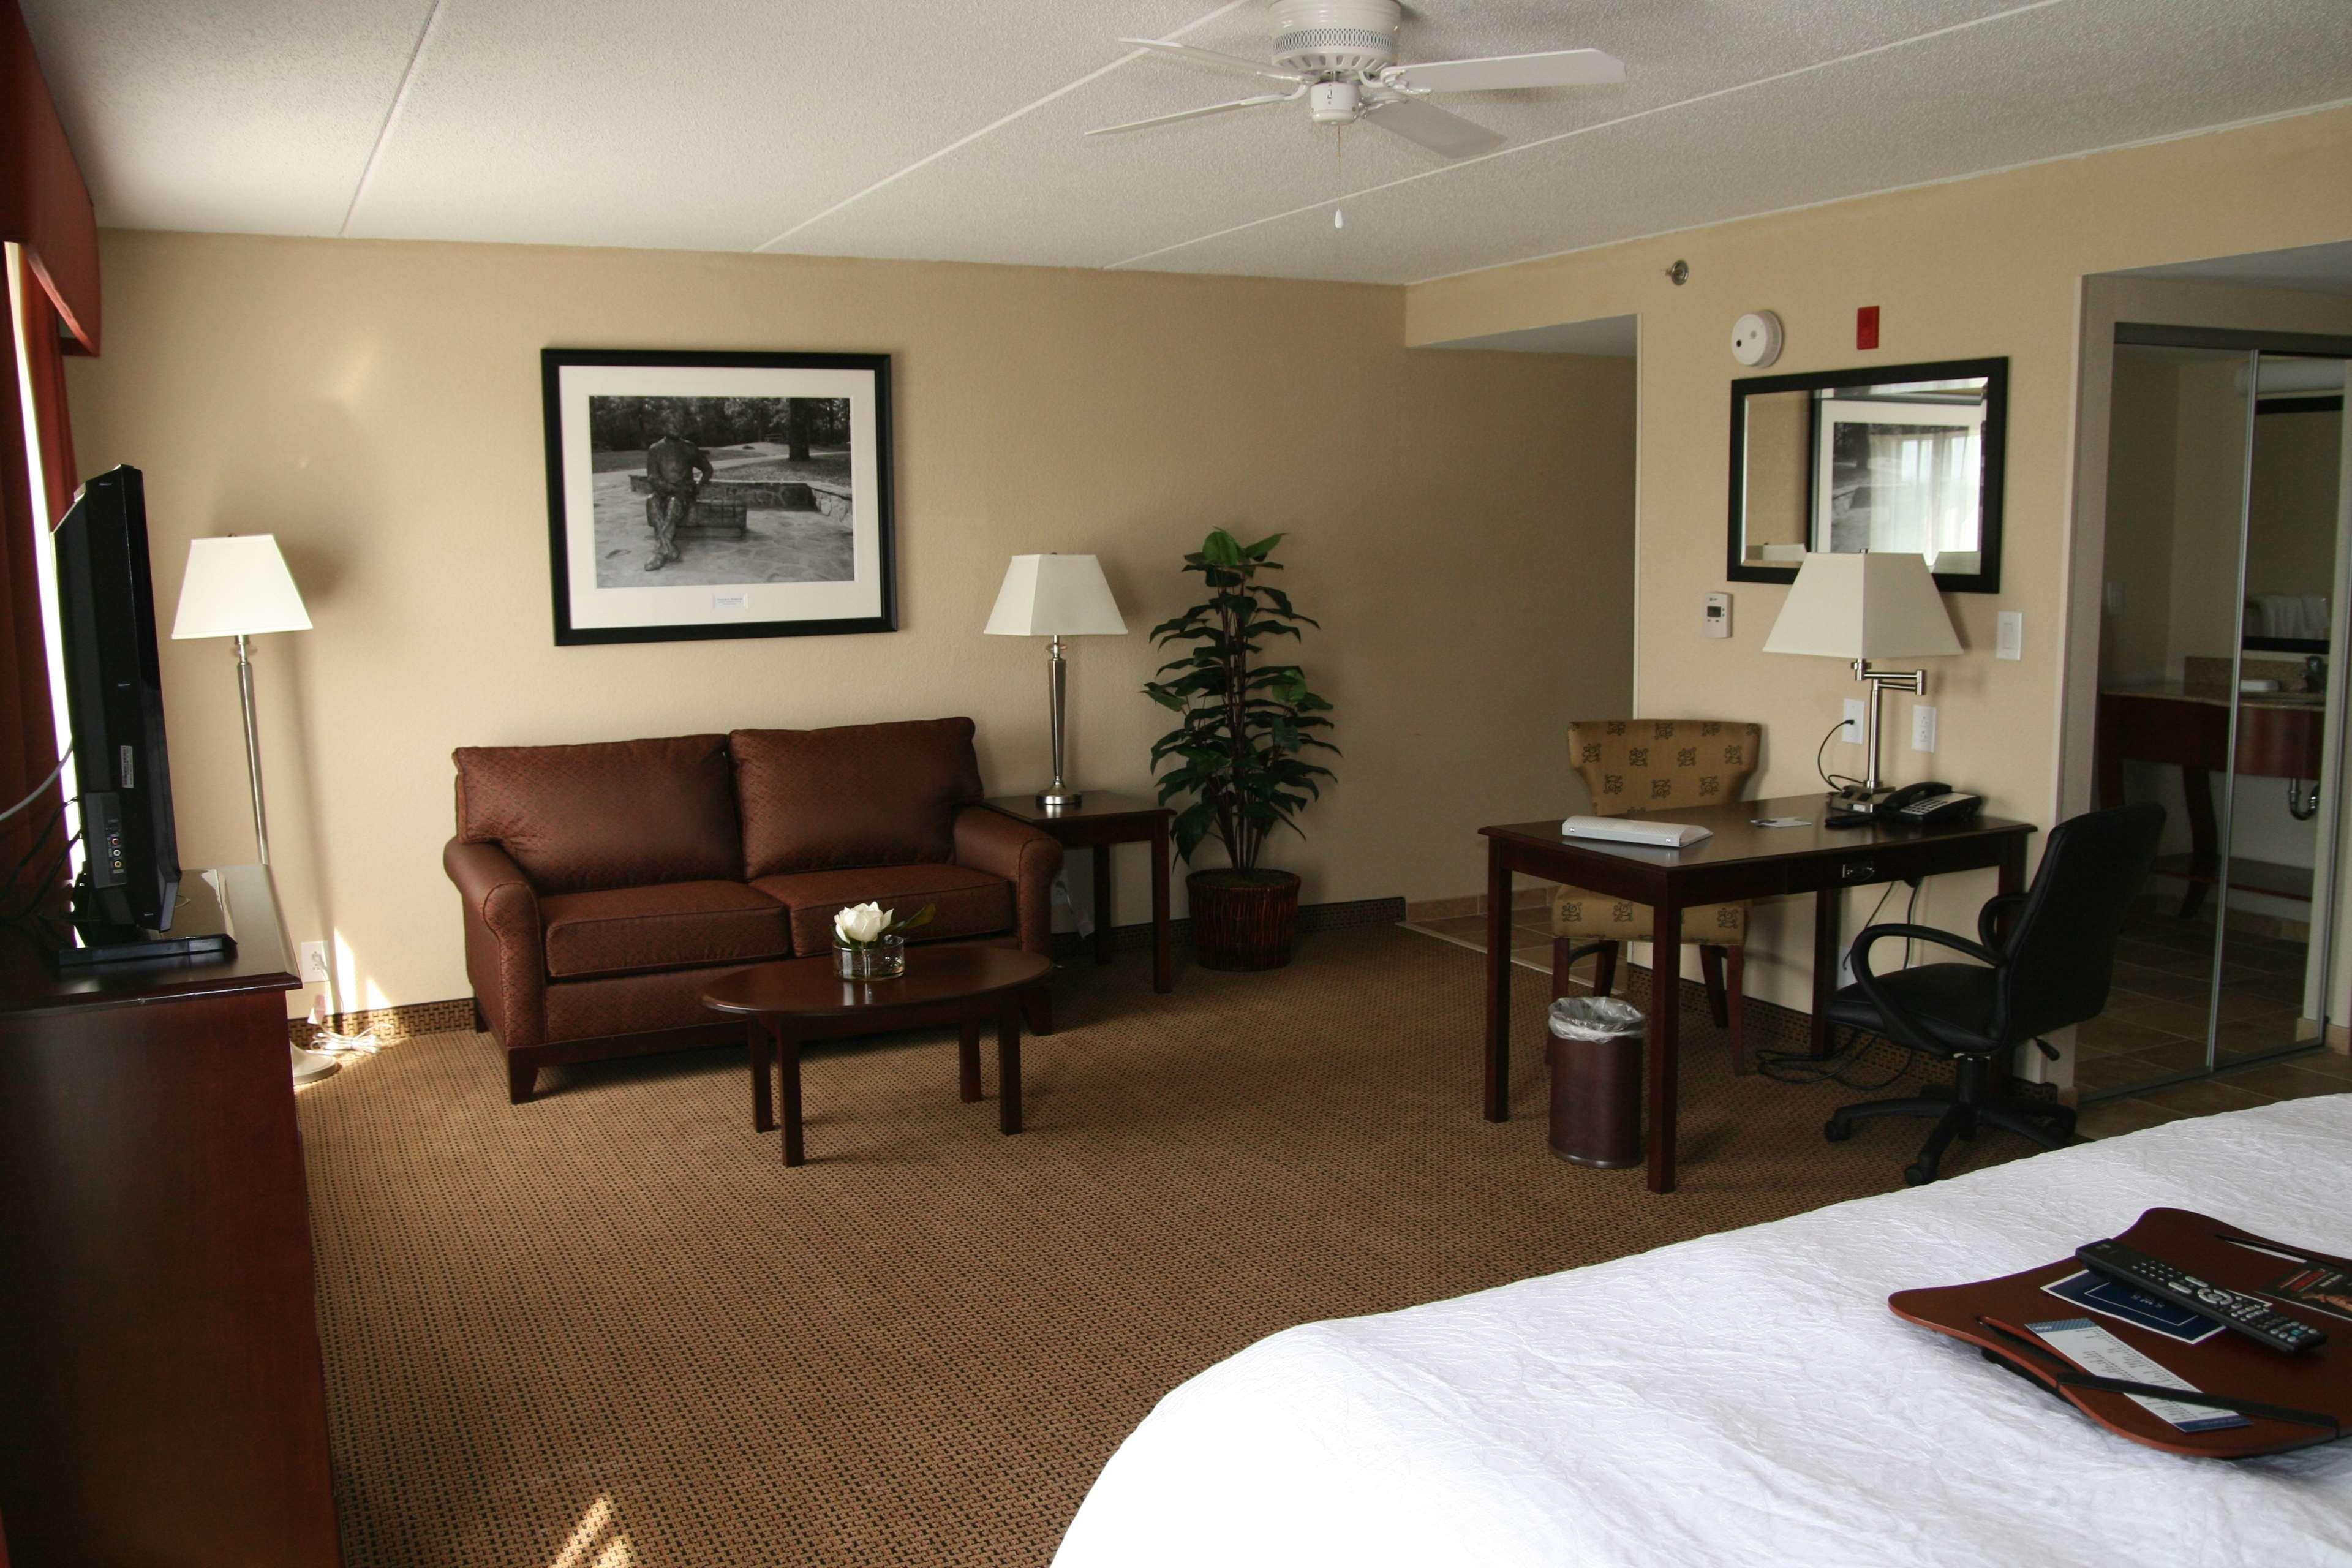 Hampton Inn & Suites Lanett-West Point image 25